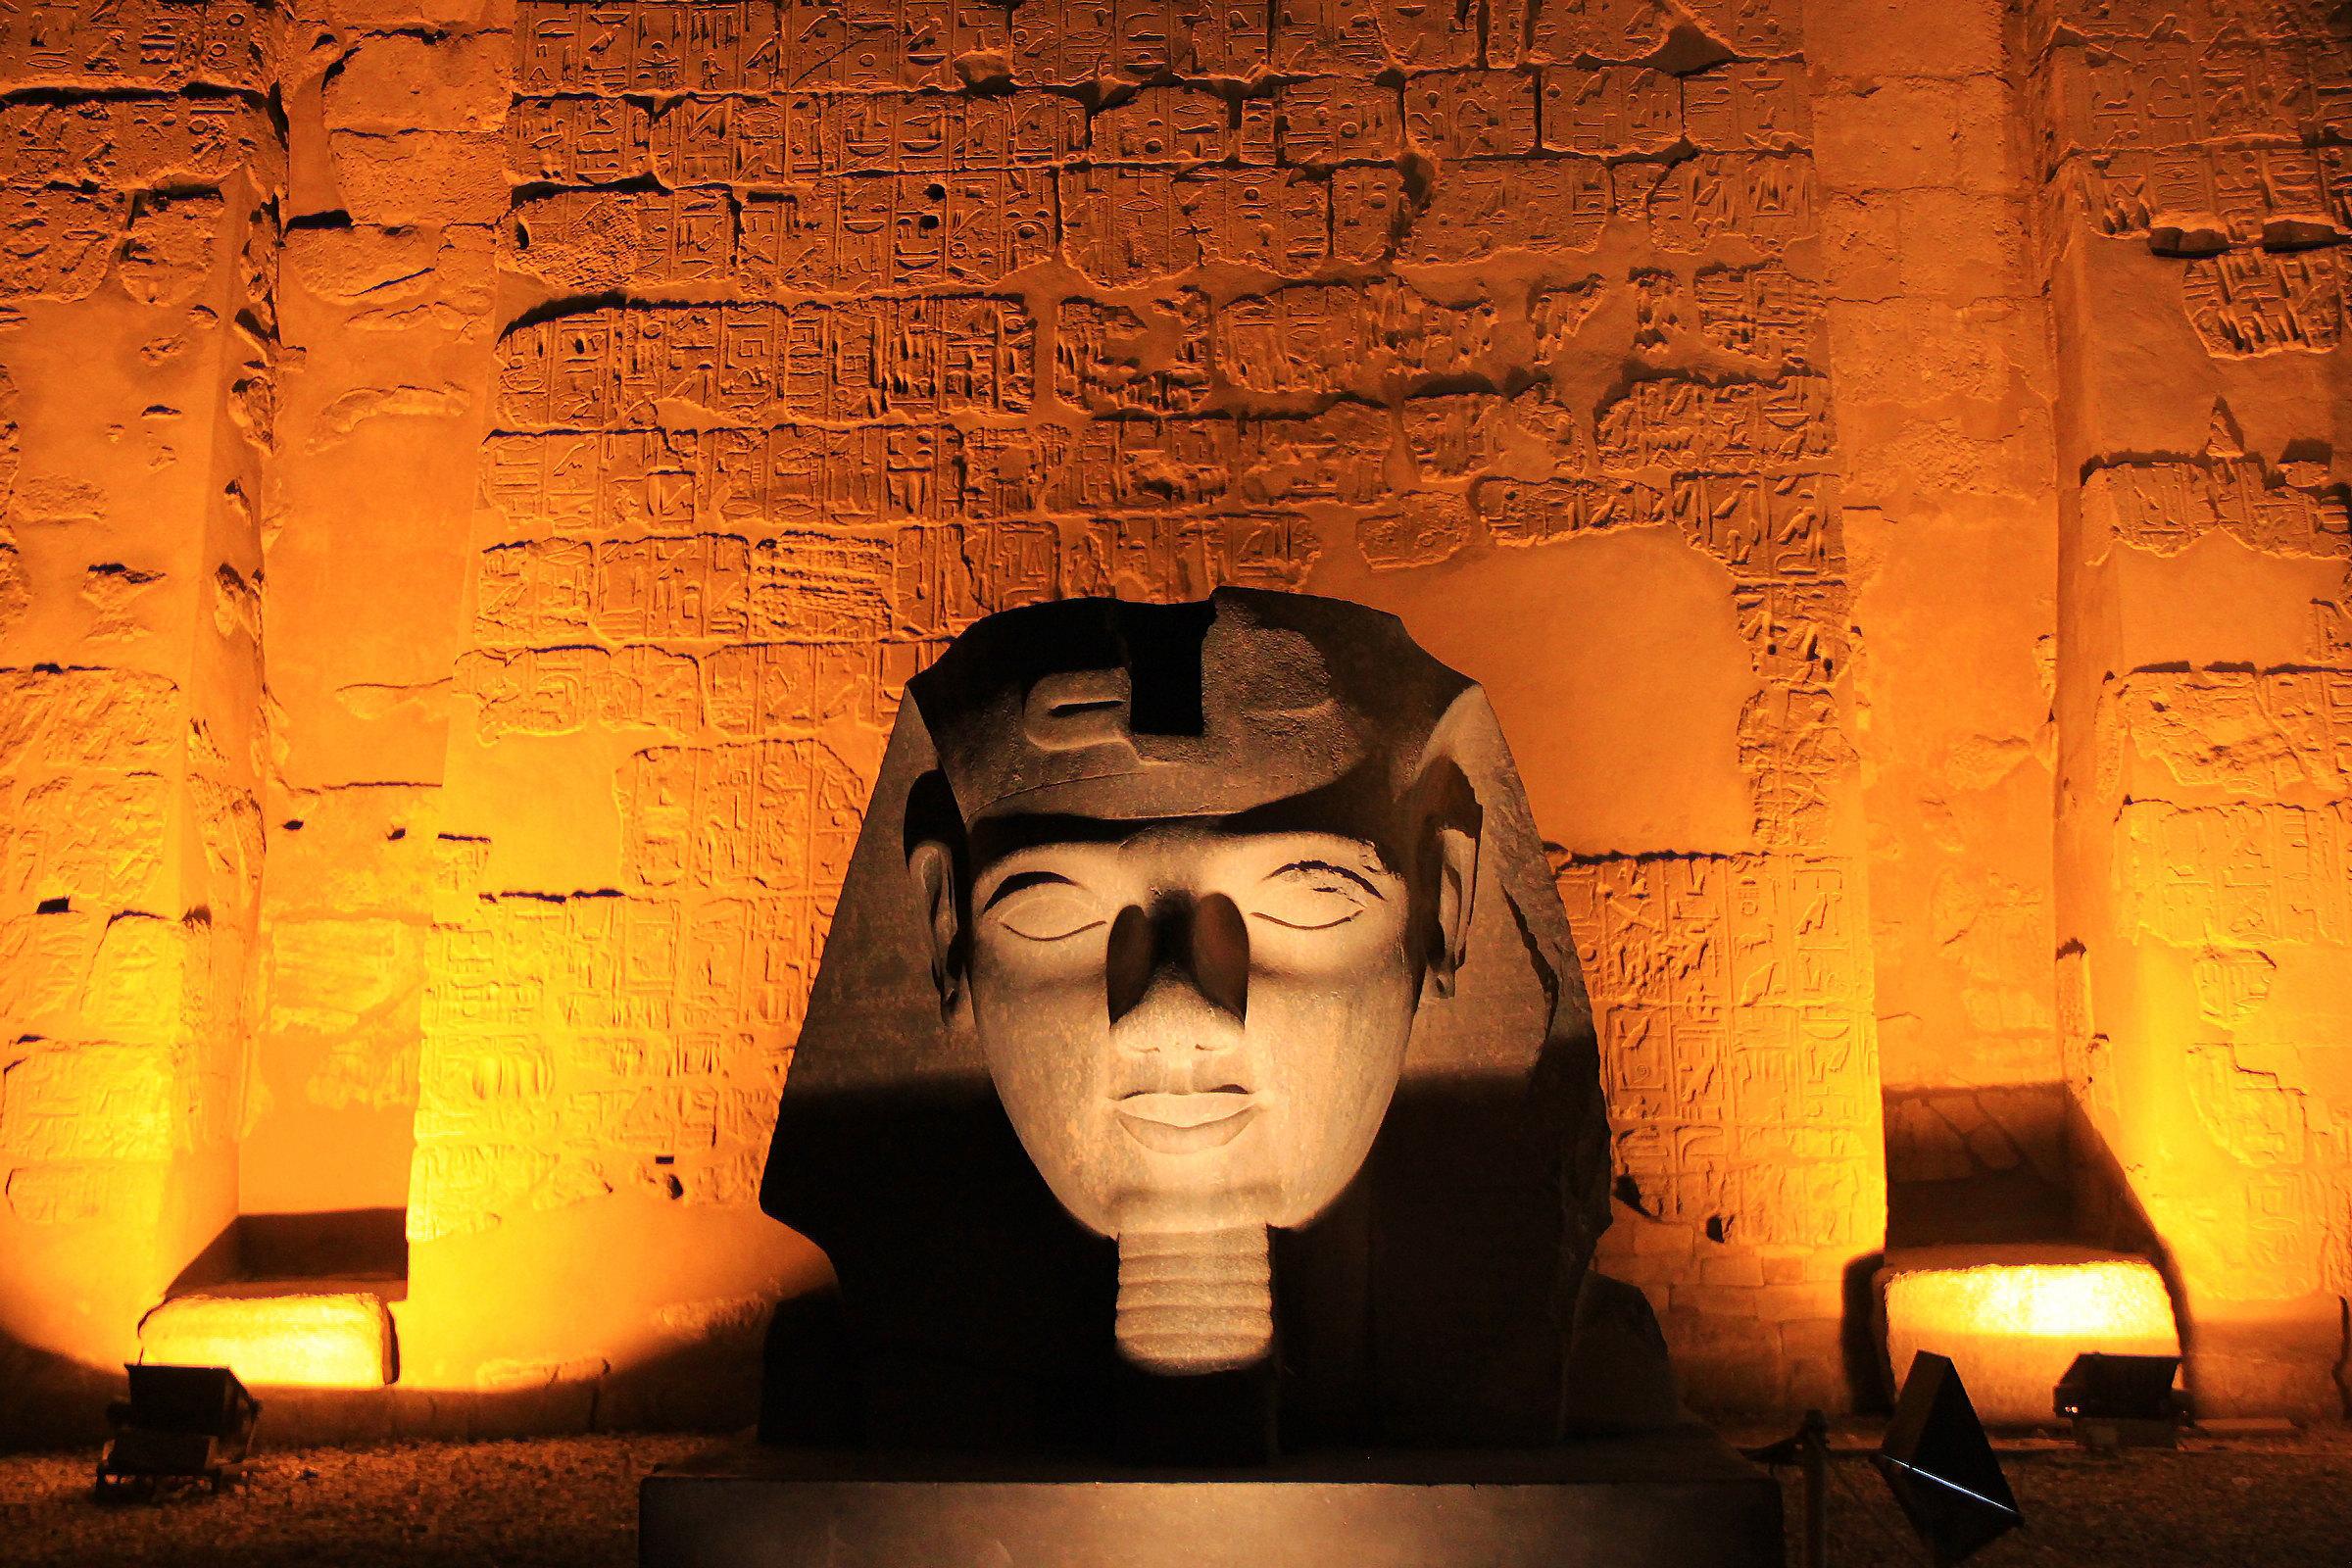 阿蒙神庙  Amun Temple of Karnak   -3